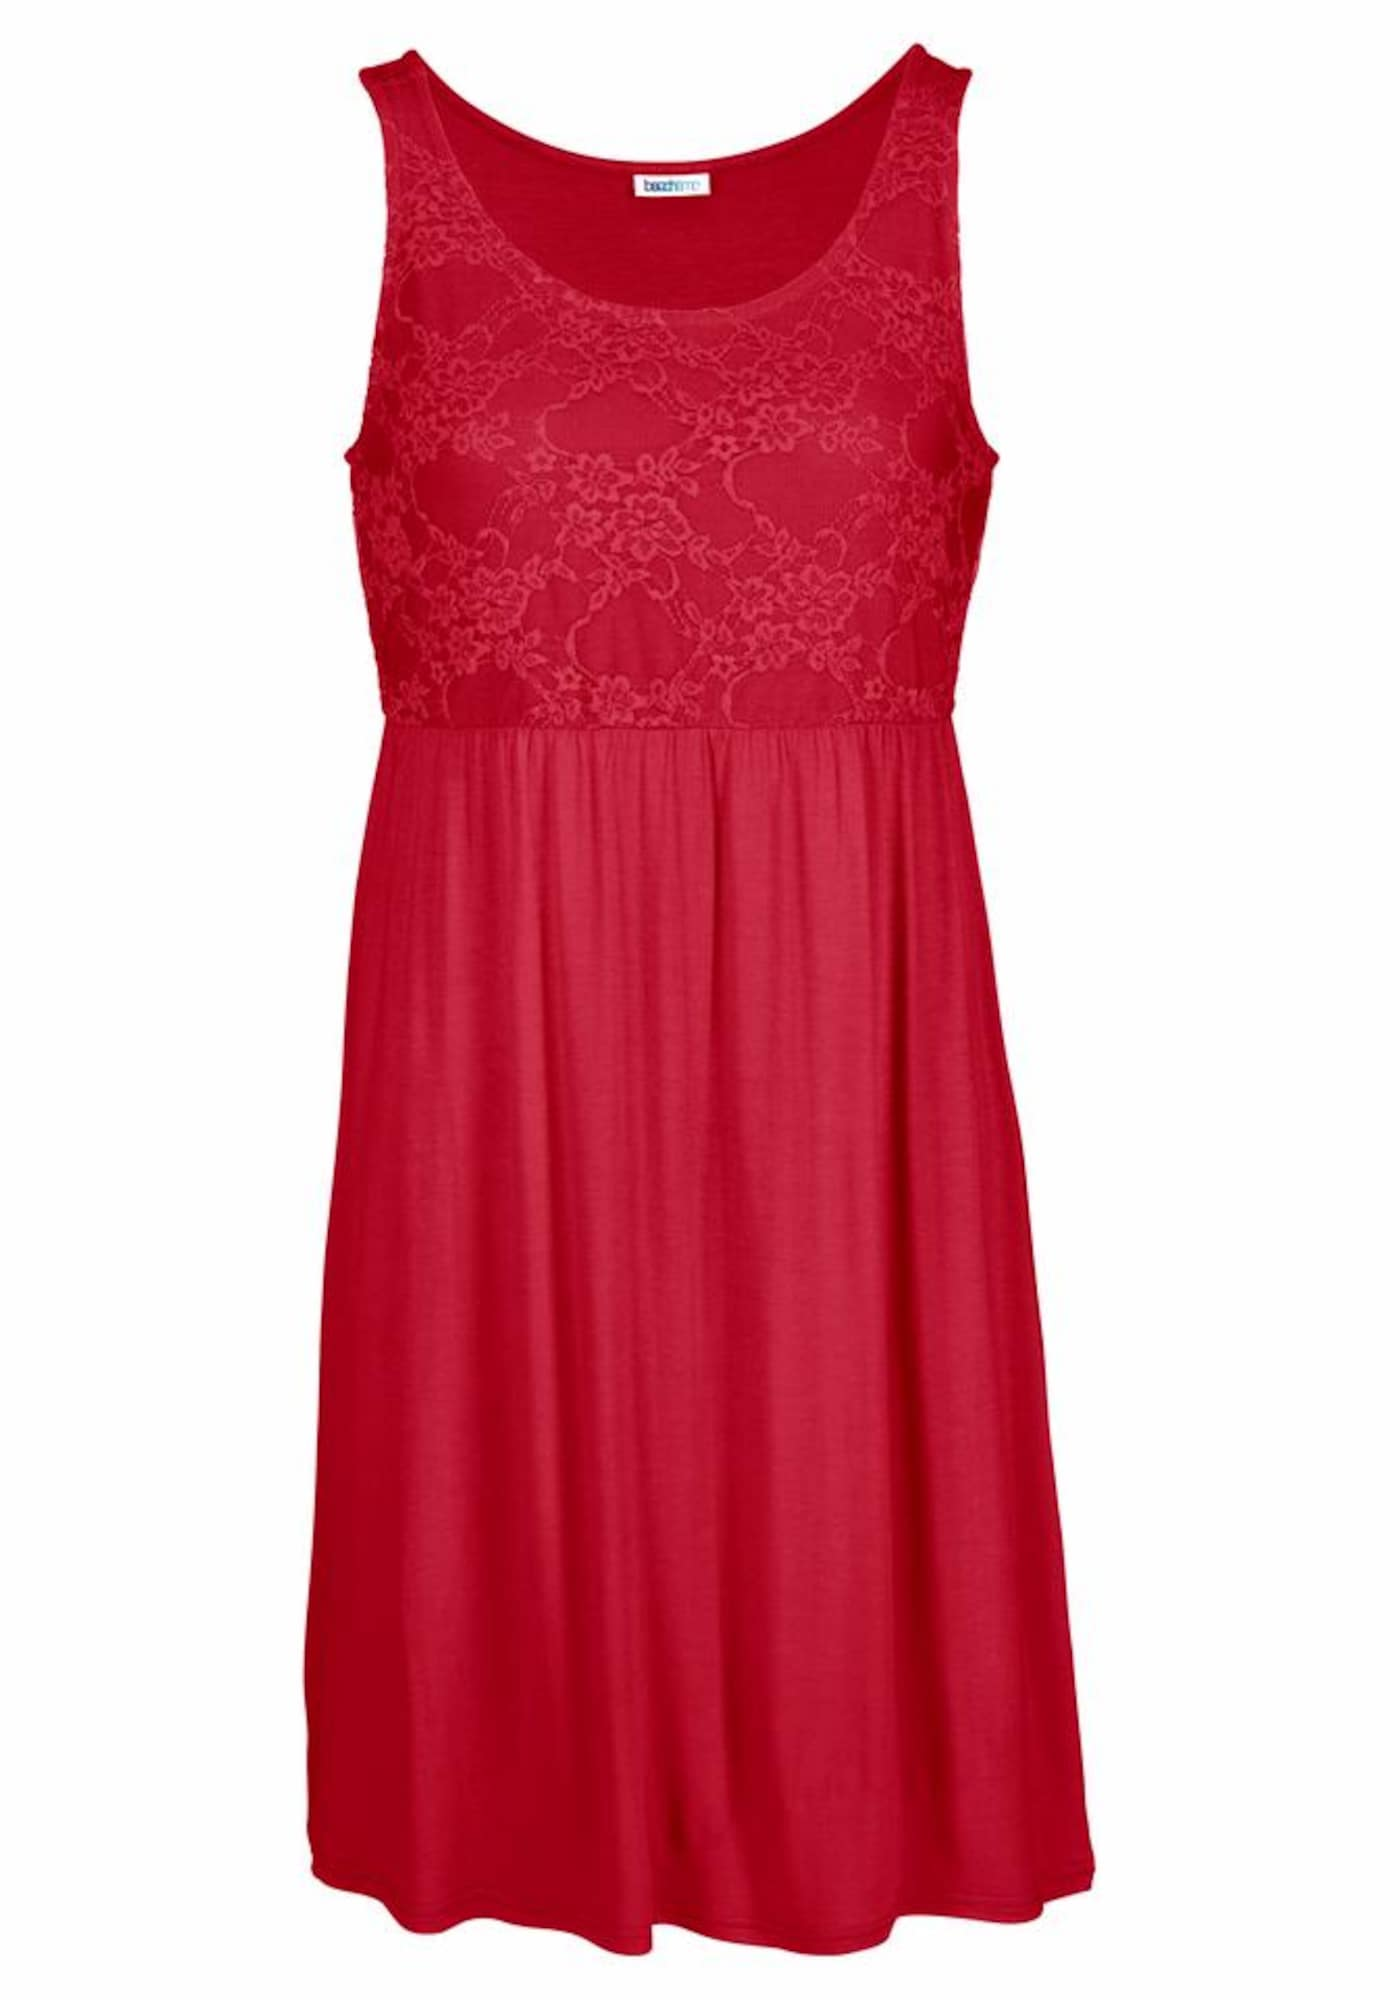 Strandkleid | Bekleidung > Kleider > Strandkleider | Rot | BEACH TIME